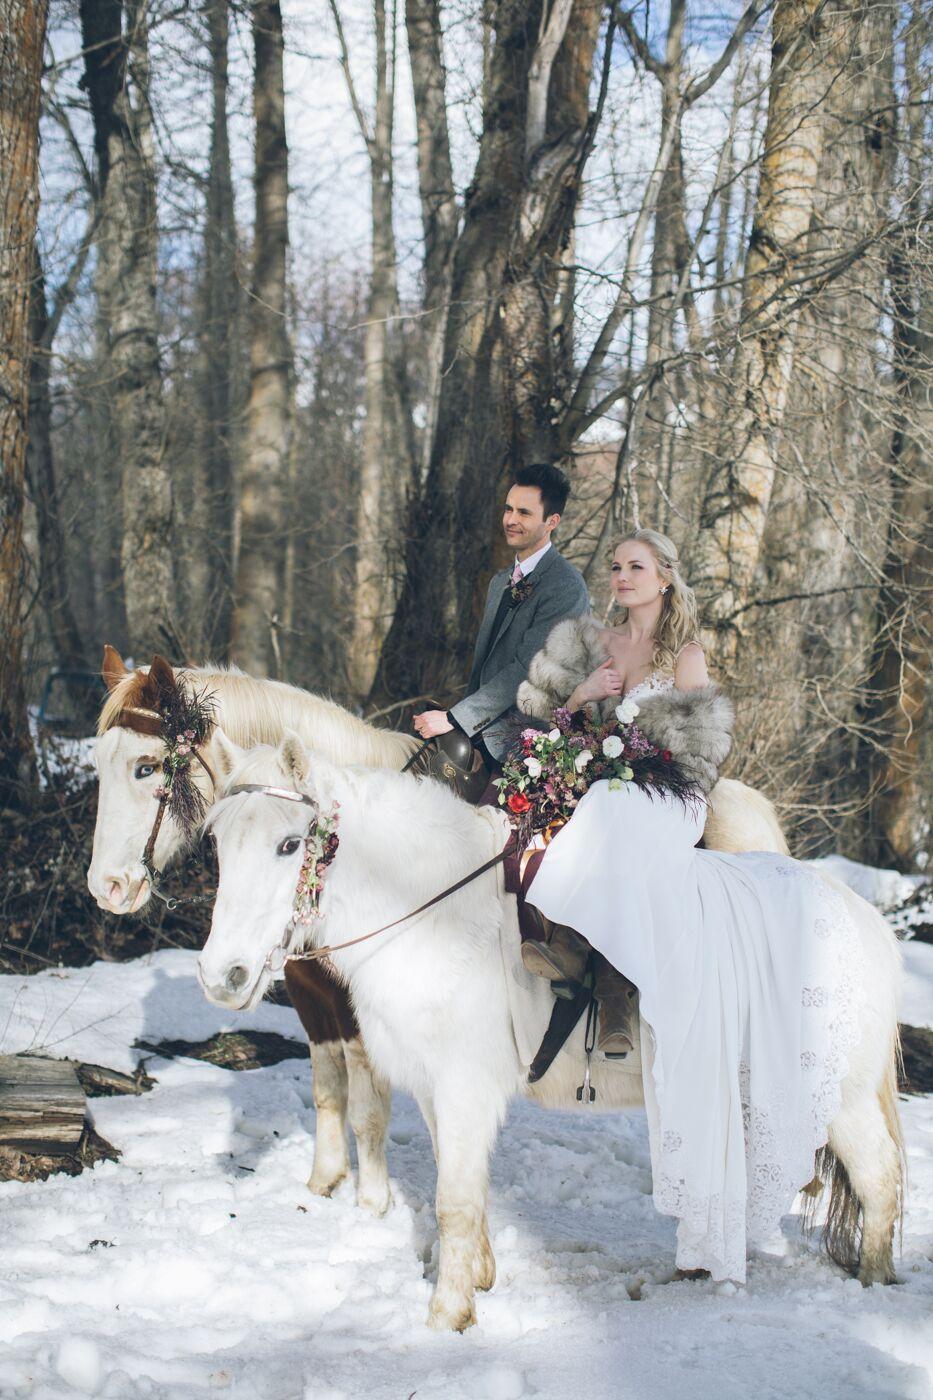 aniko-photography-mt-hood-bnb-wedding-50_preview.jpeg